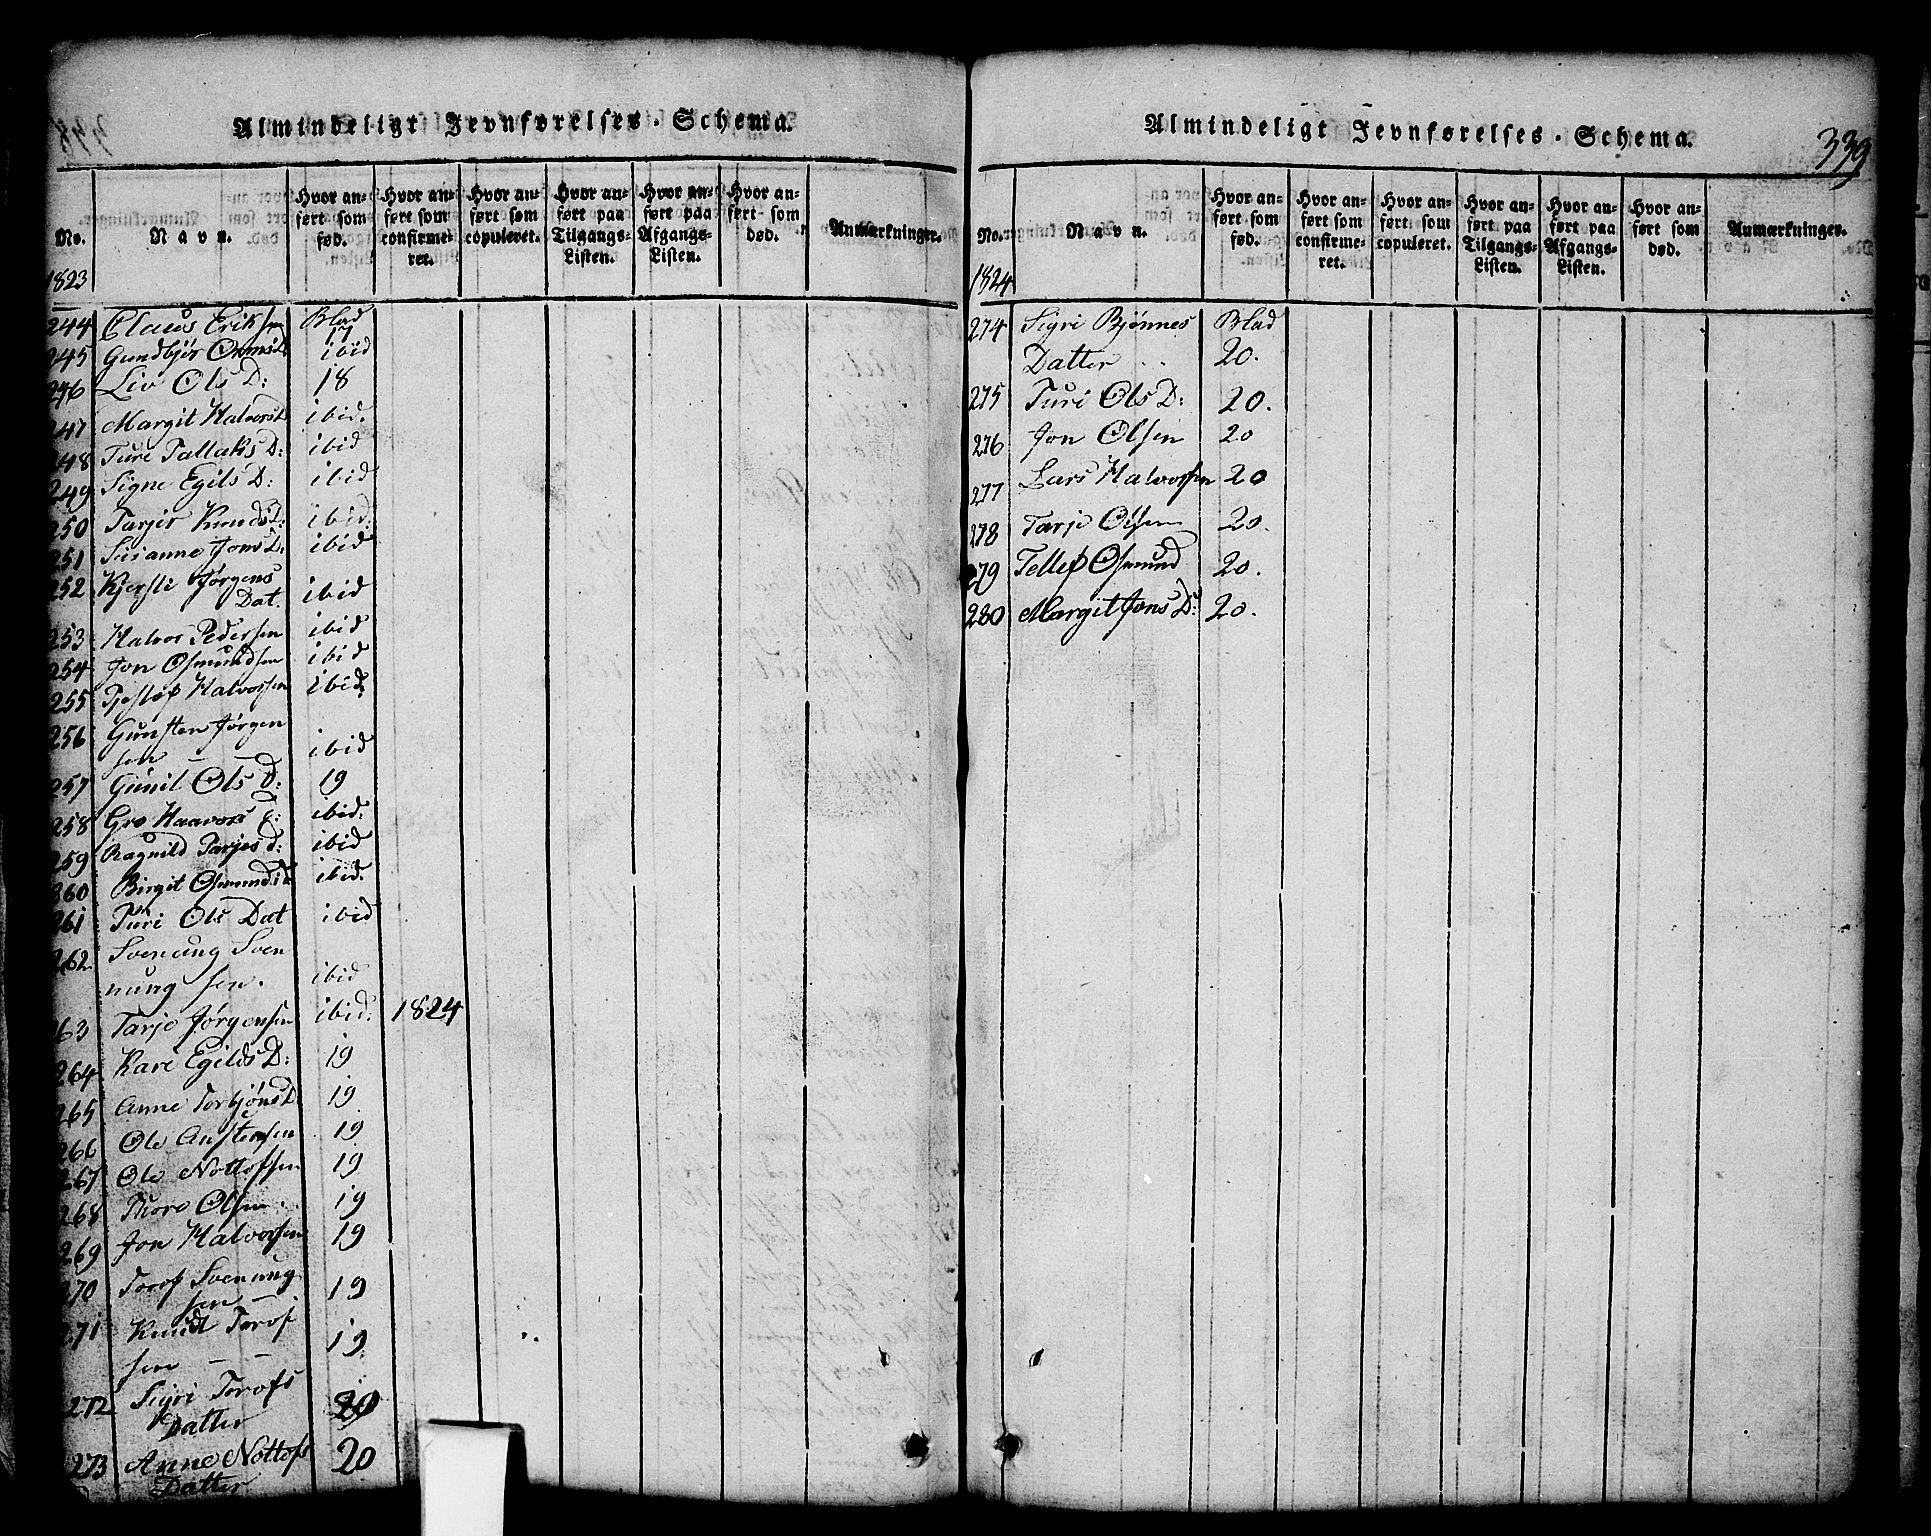 SAKO, Nissedal kirkebøker, G/Gb/L0001: Klokkerbok nr. II 1, 1814-1862, s. 339